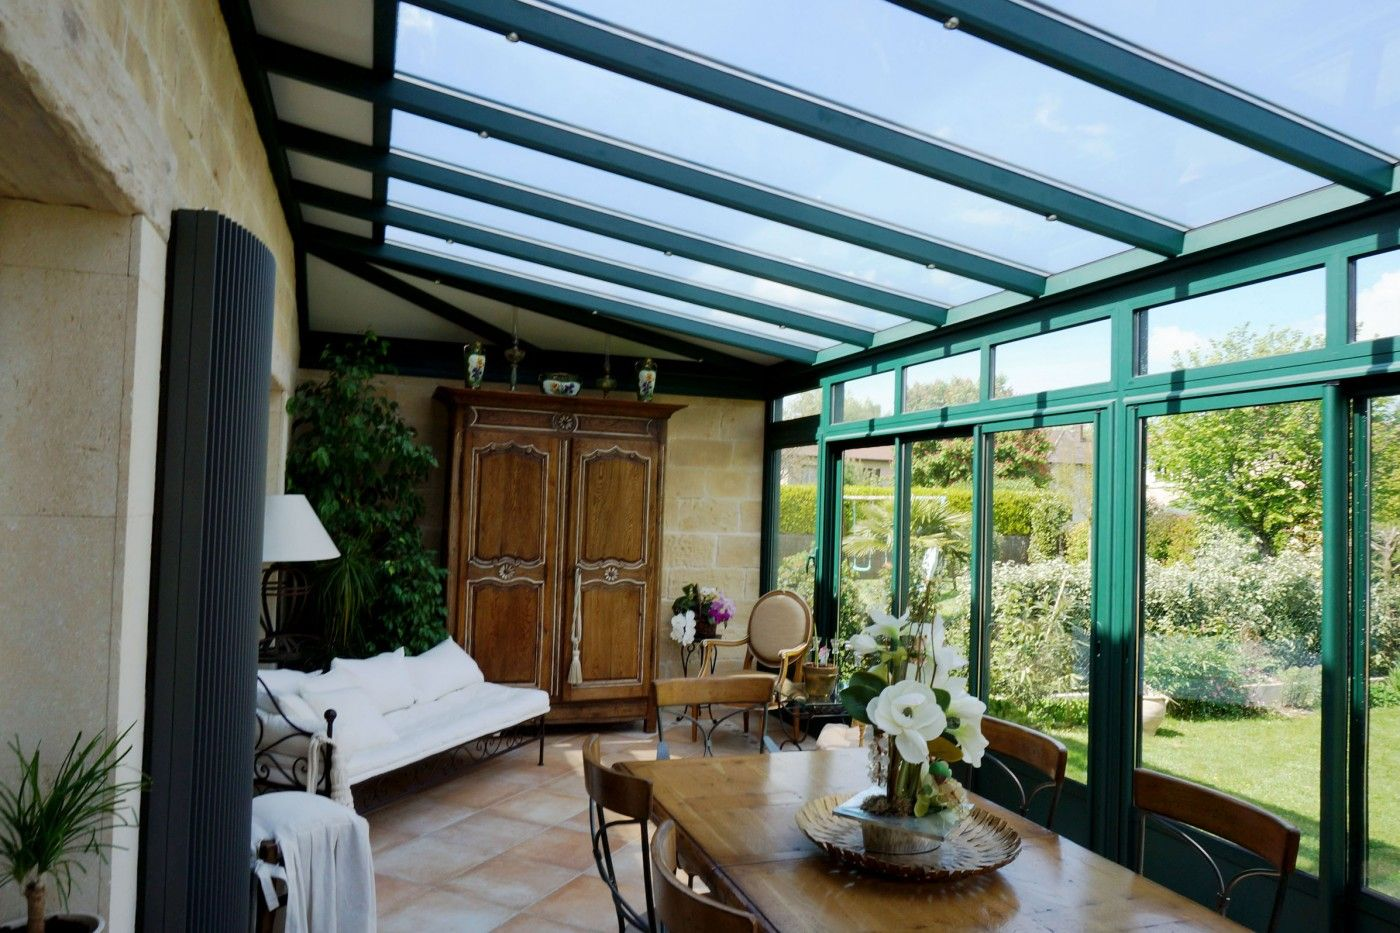 Véranda de style, à l'ancienne, classique, victorienne, traditionnelle   Veranda aluminium ...